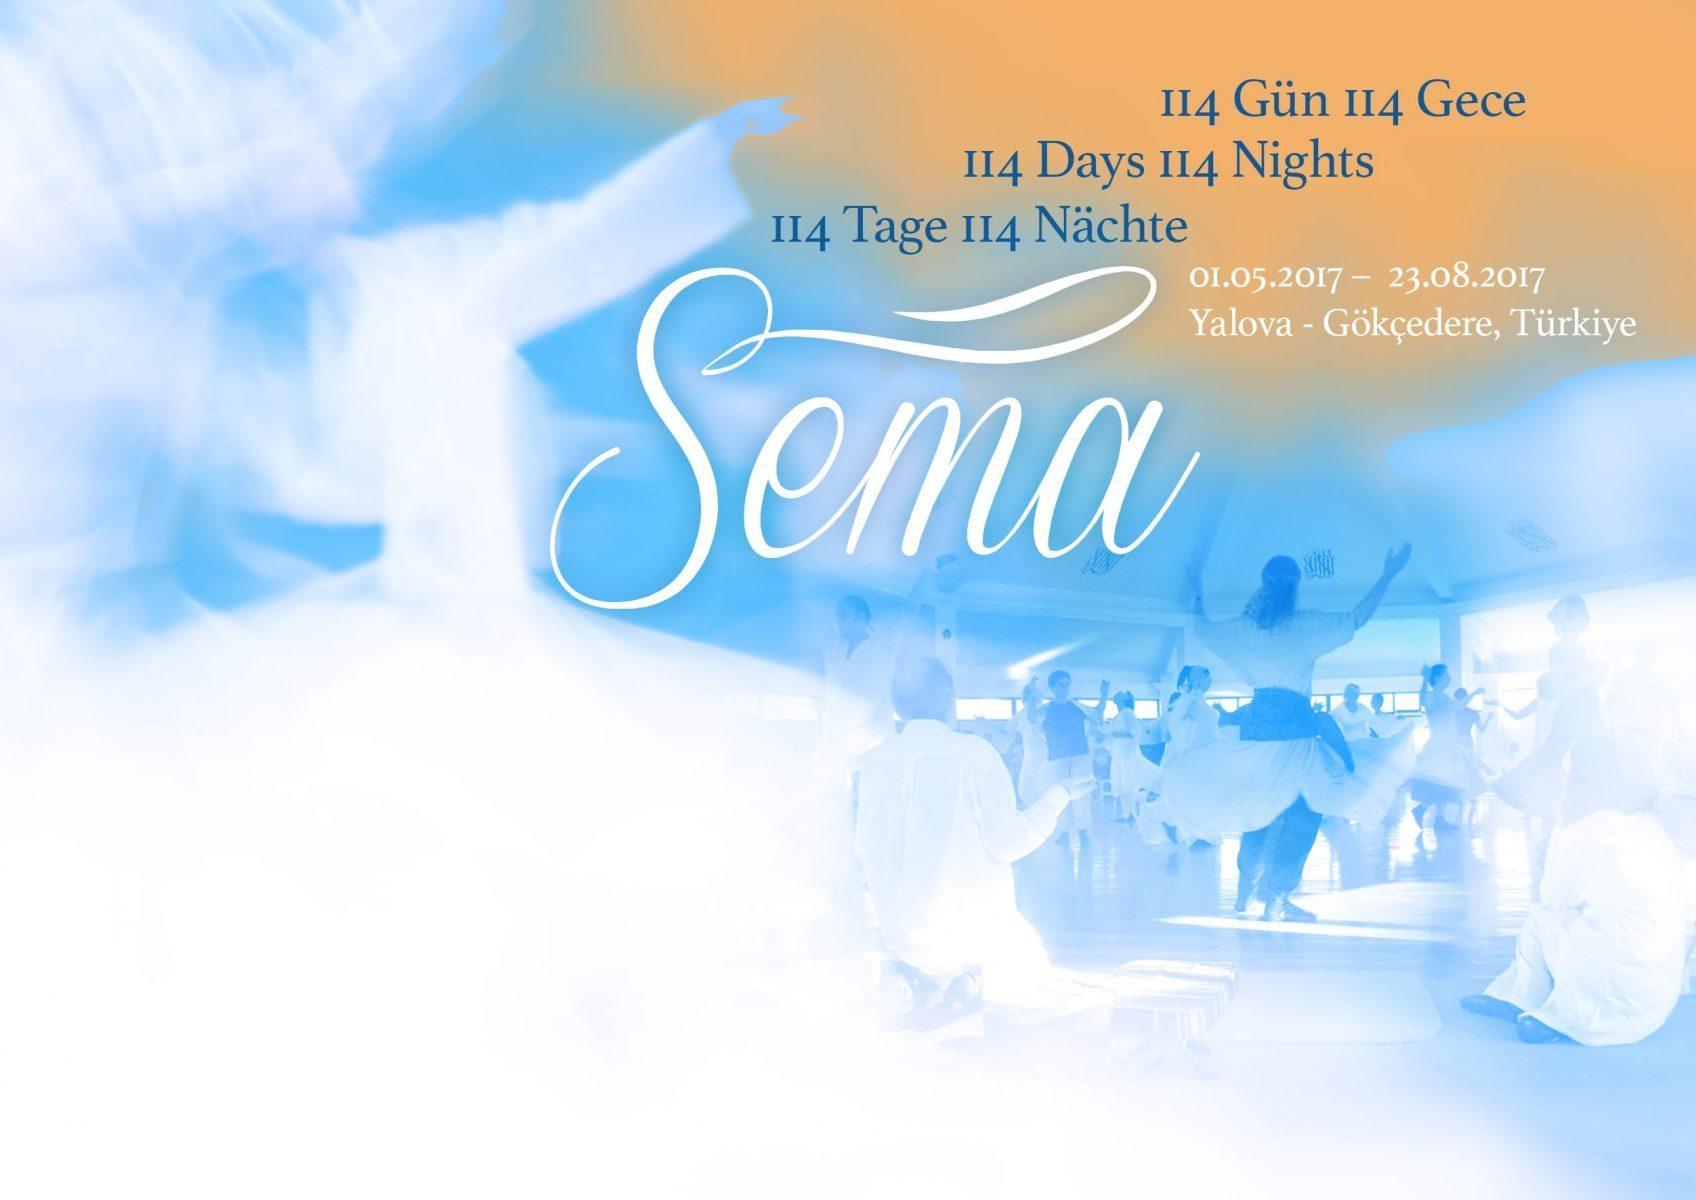 Tümata Yalova Sema 2017